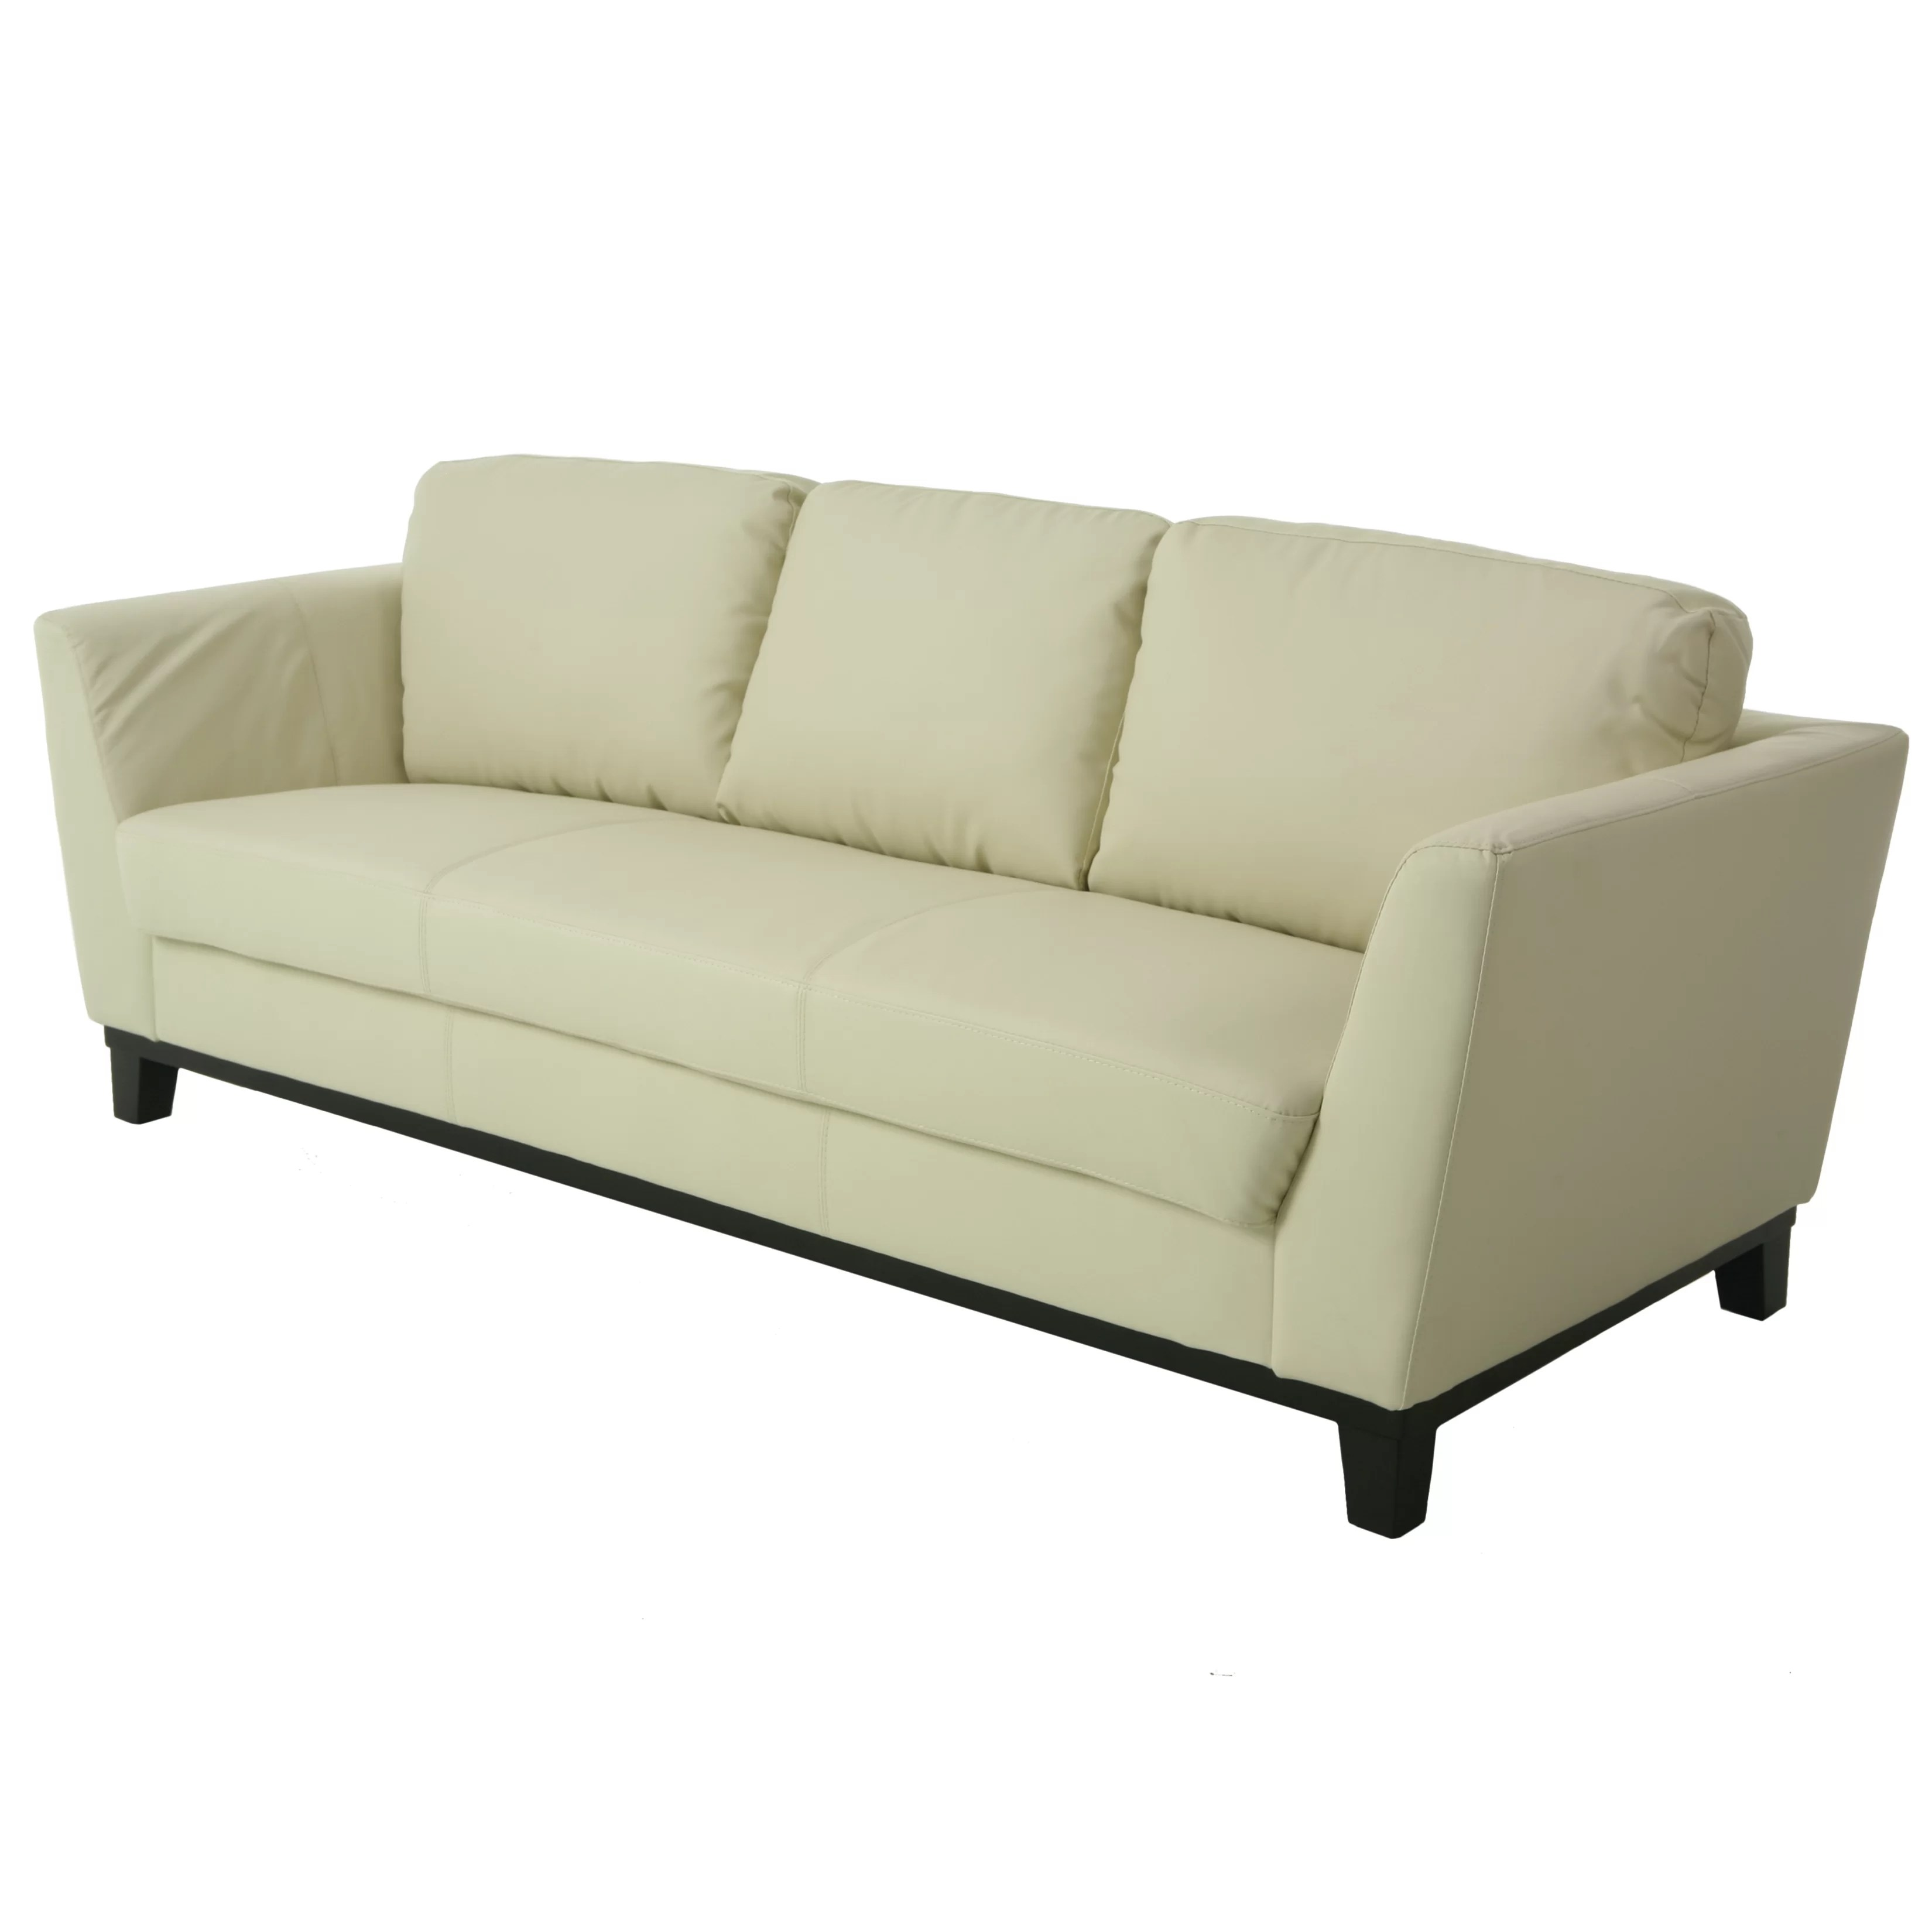 chair upholstery fabric nz rigby accent and ottoman impacterra new zealand sofa wayfair